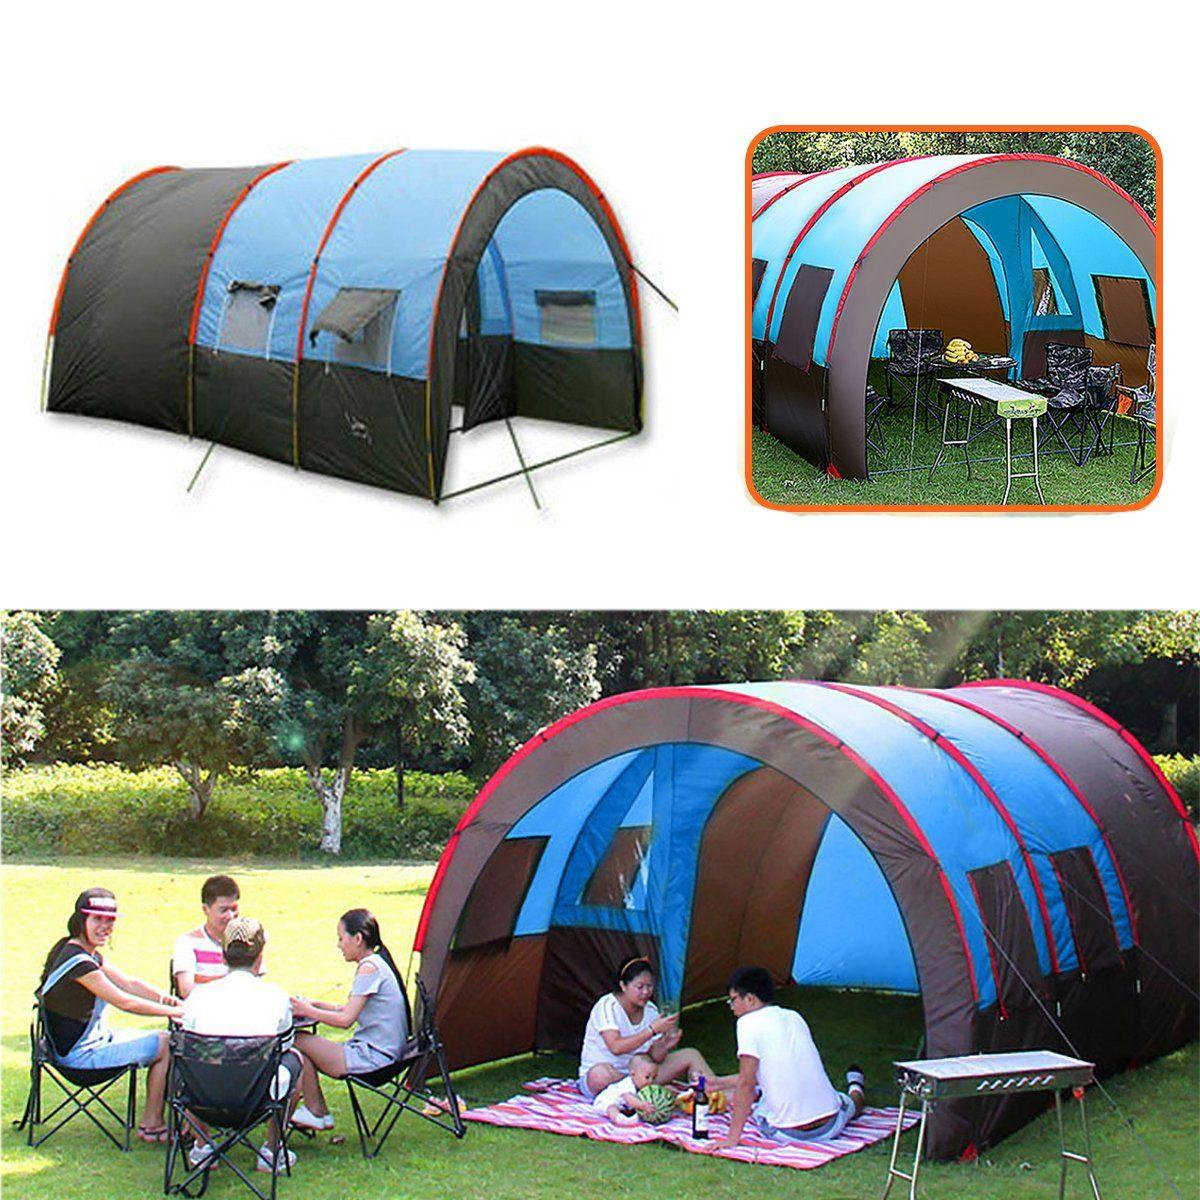 Xmund XD ET4 Camping Tent 8 10 People Waterproof Double